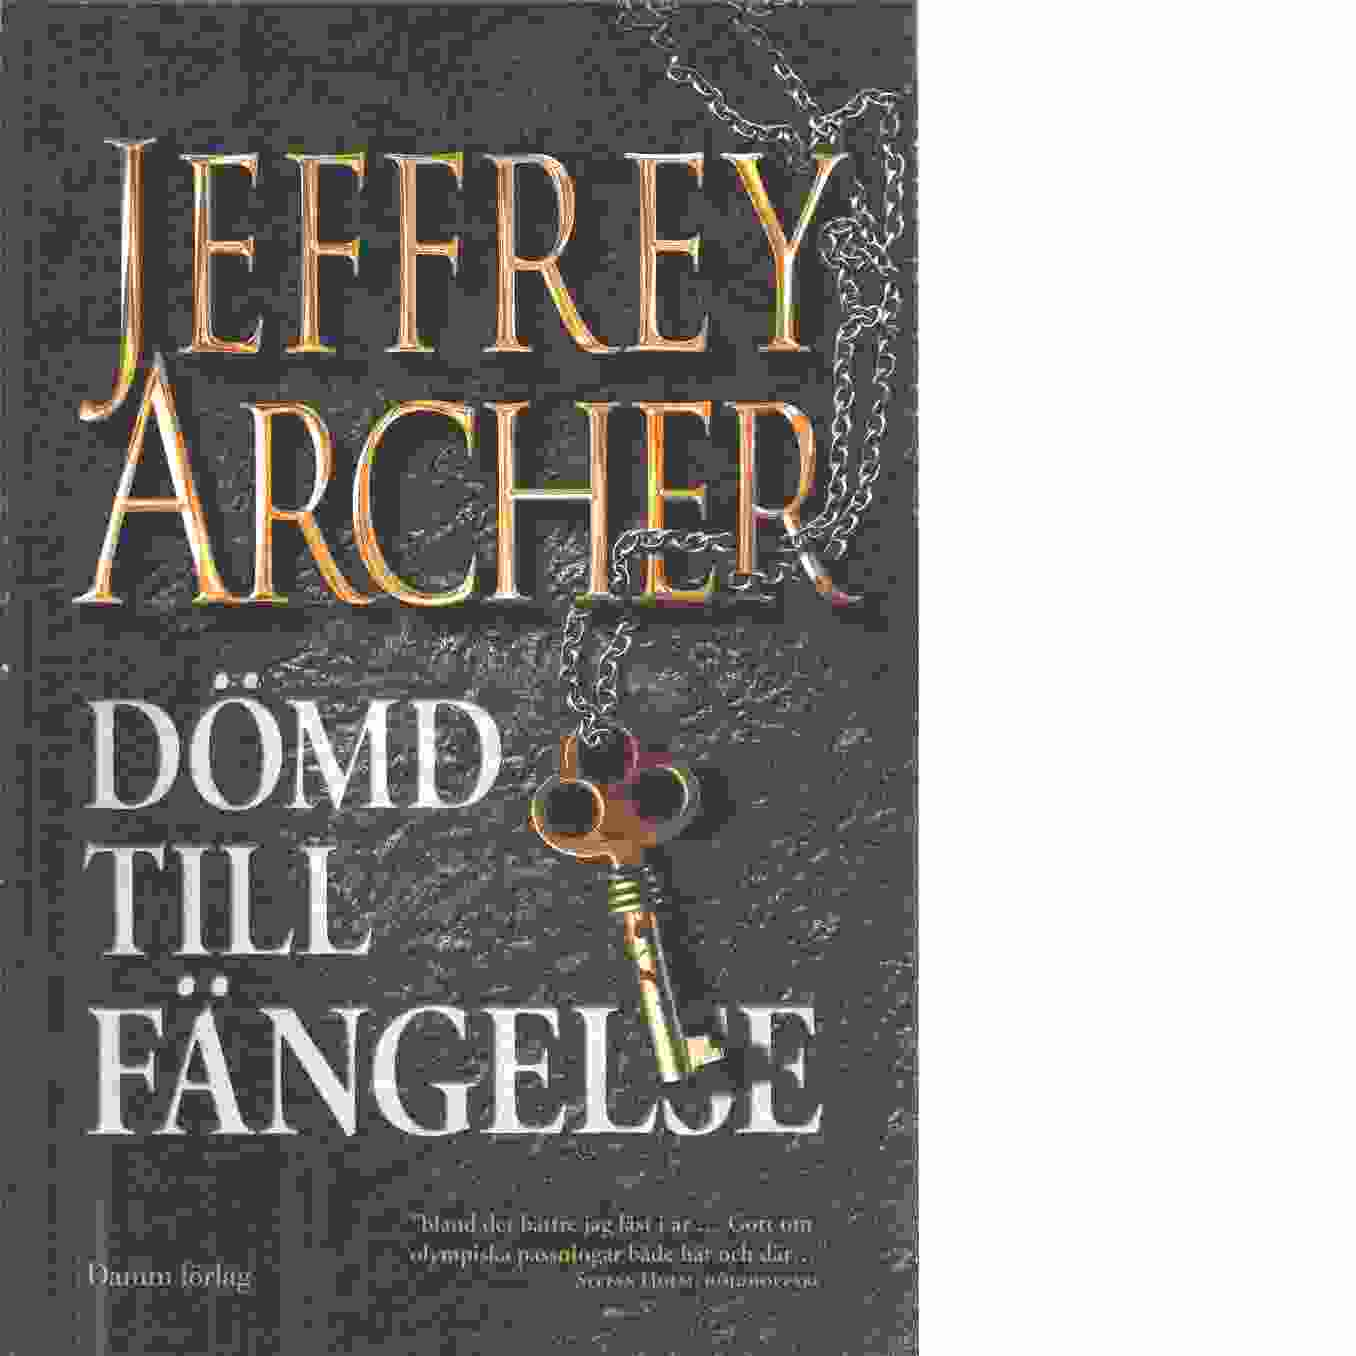 Dömd till fängelse  - Archer, Jeffrey